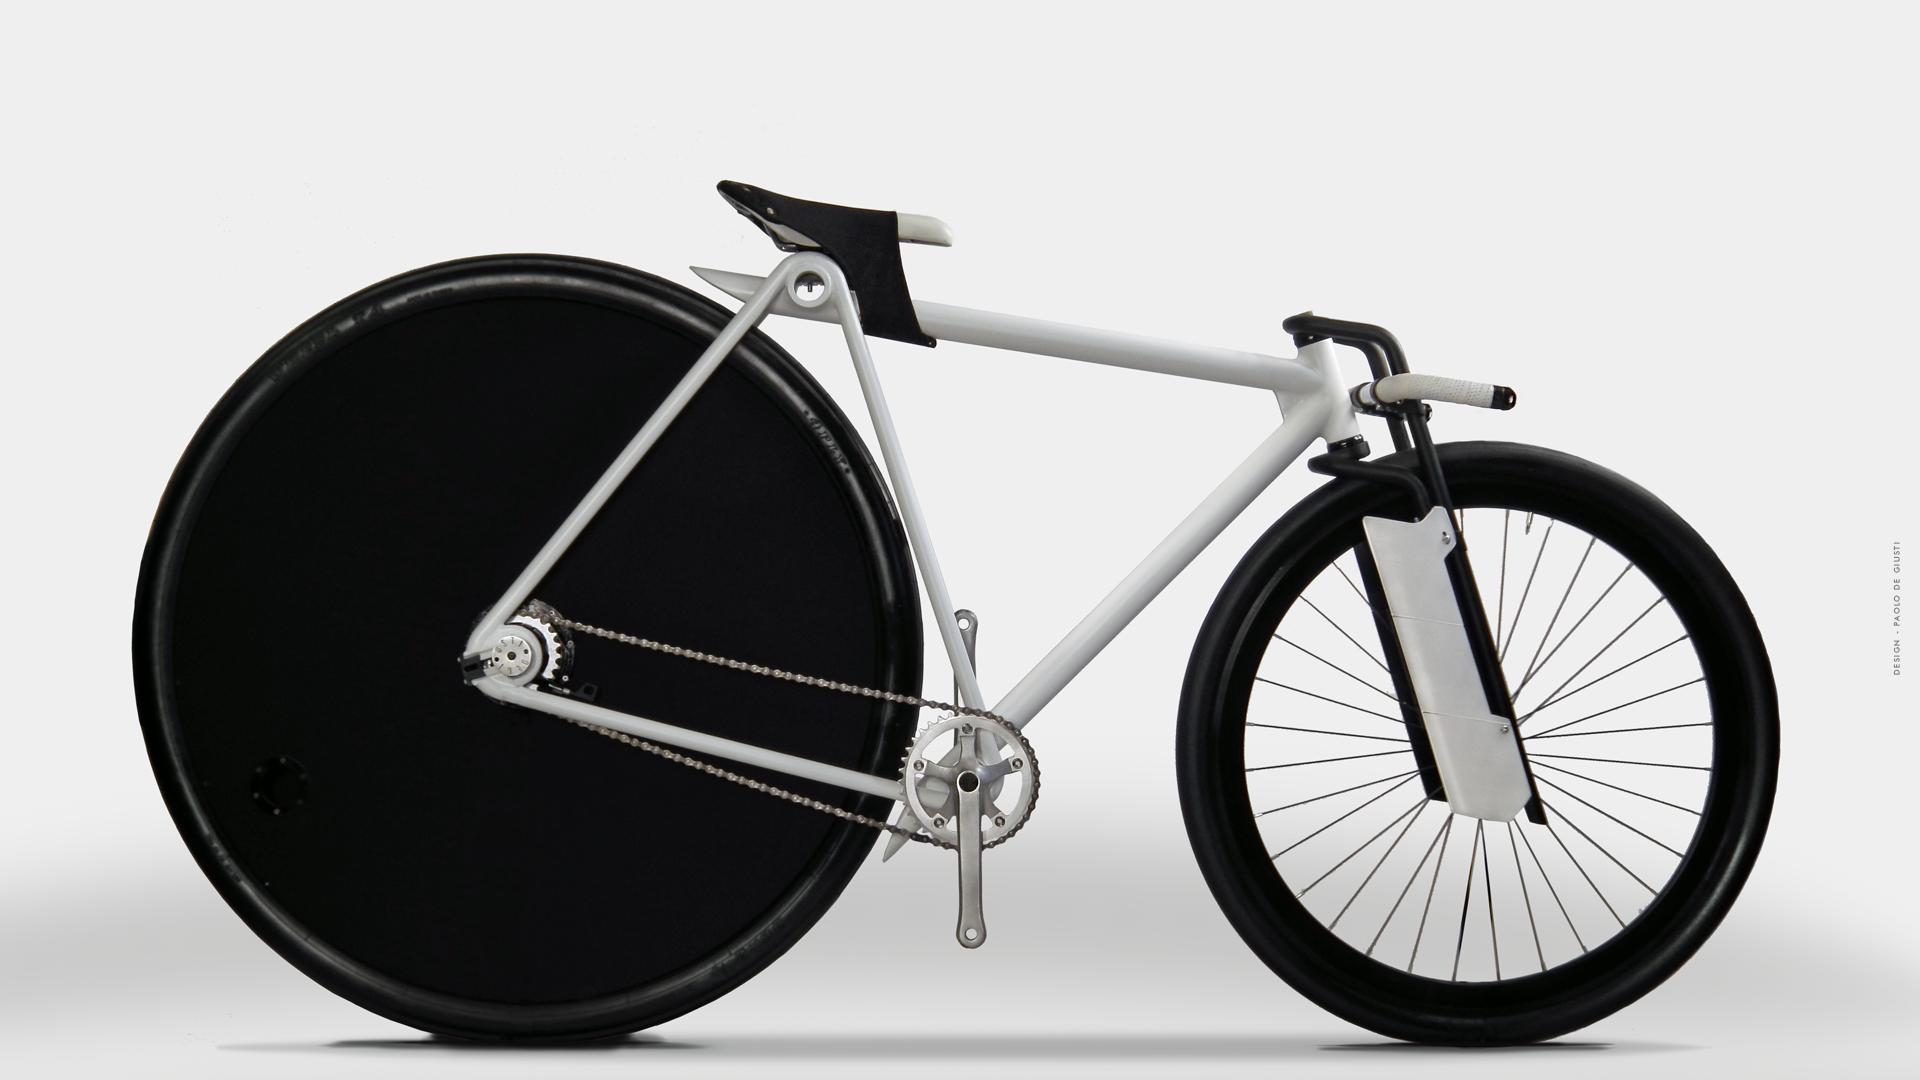 3628 postale paolo de giusti urban pursuit bike messenger hybrid electric side view